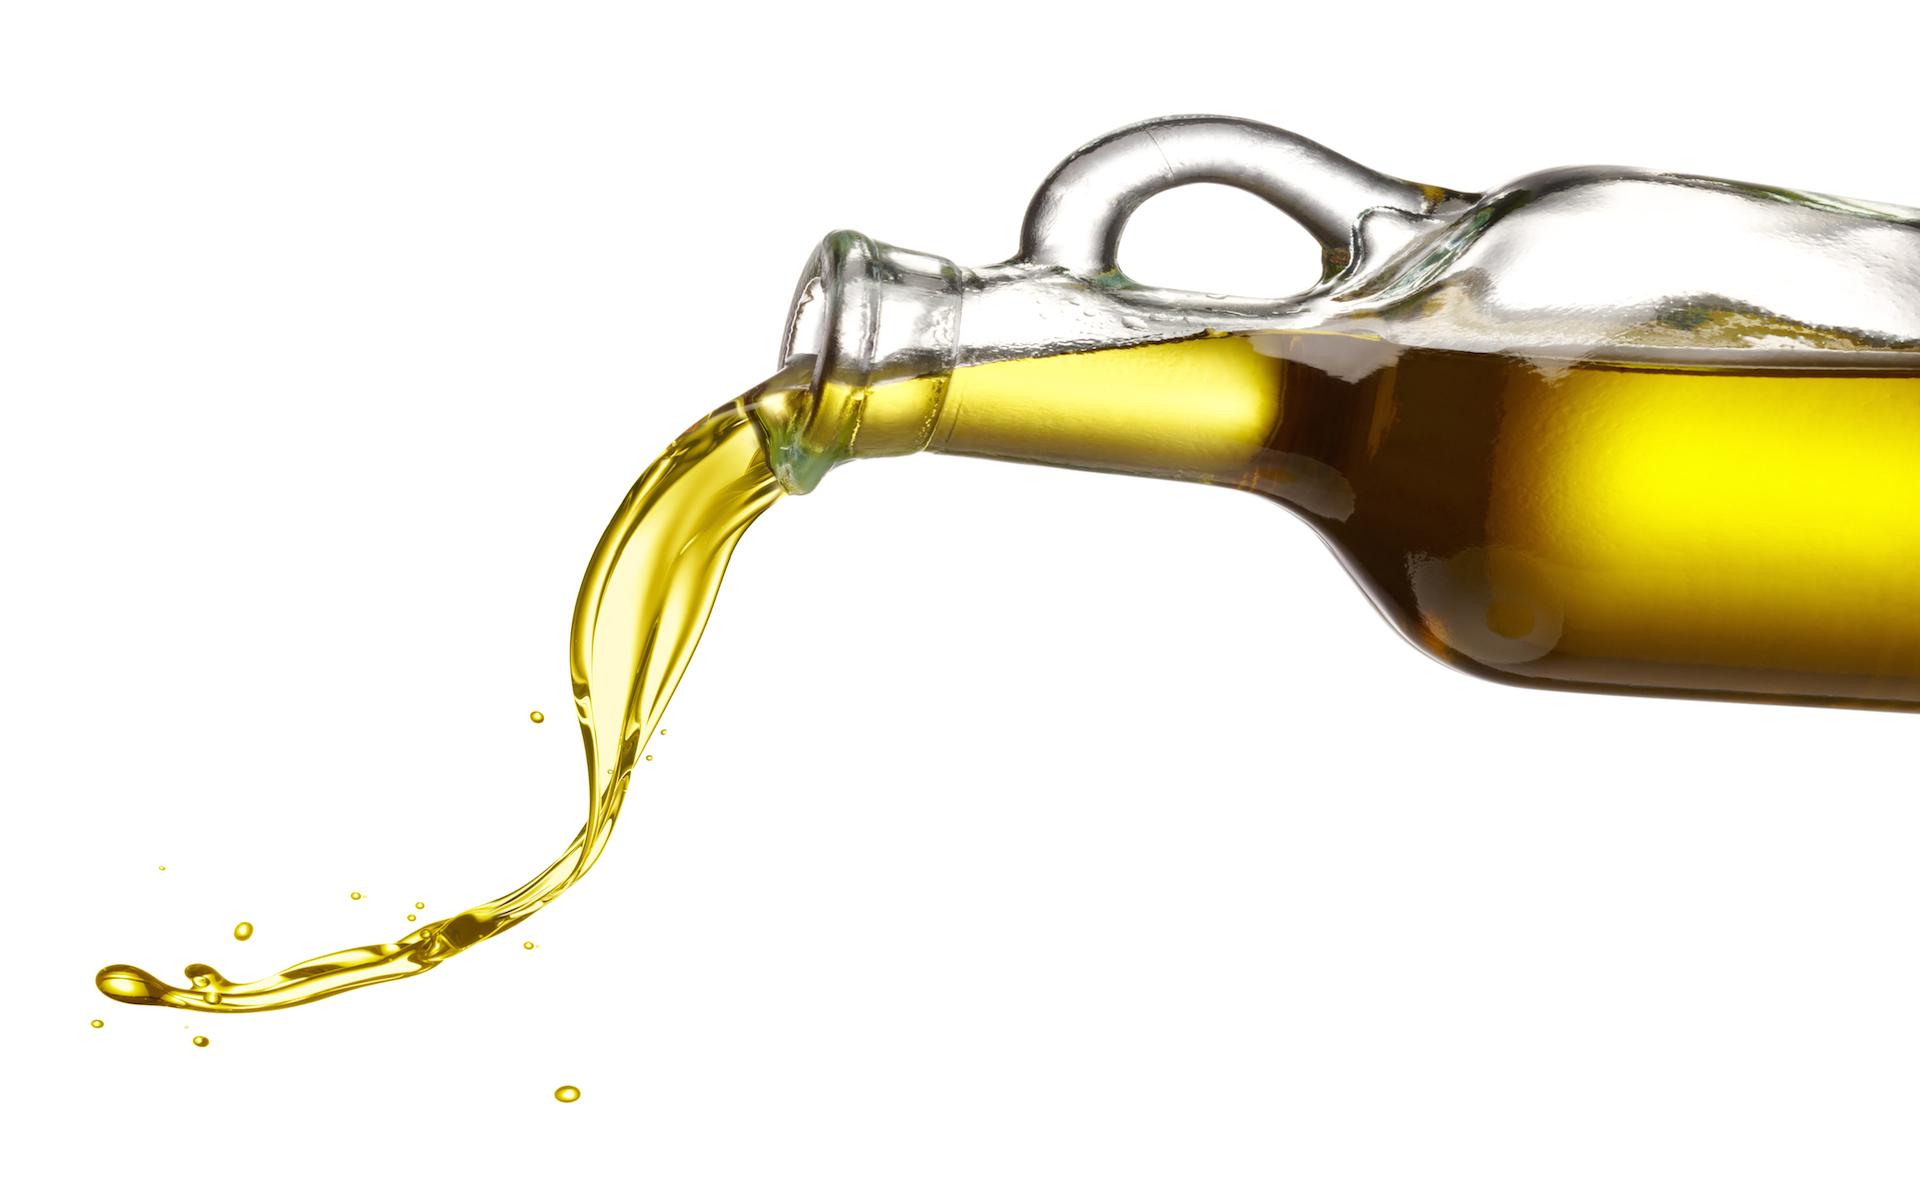 Olive Oil Wallpaper 5155 1920x1200   uMadcom 1920x1200